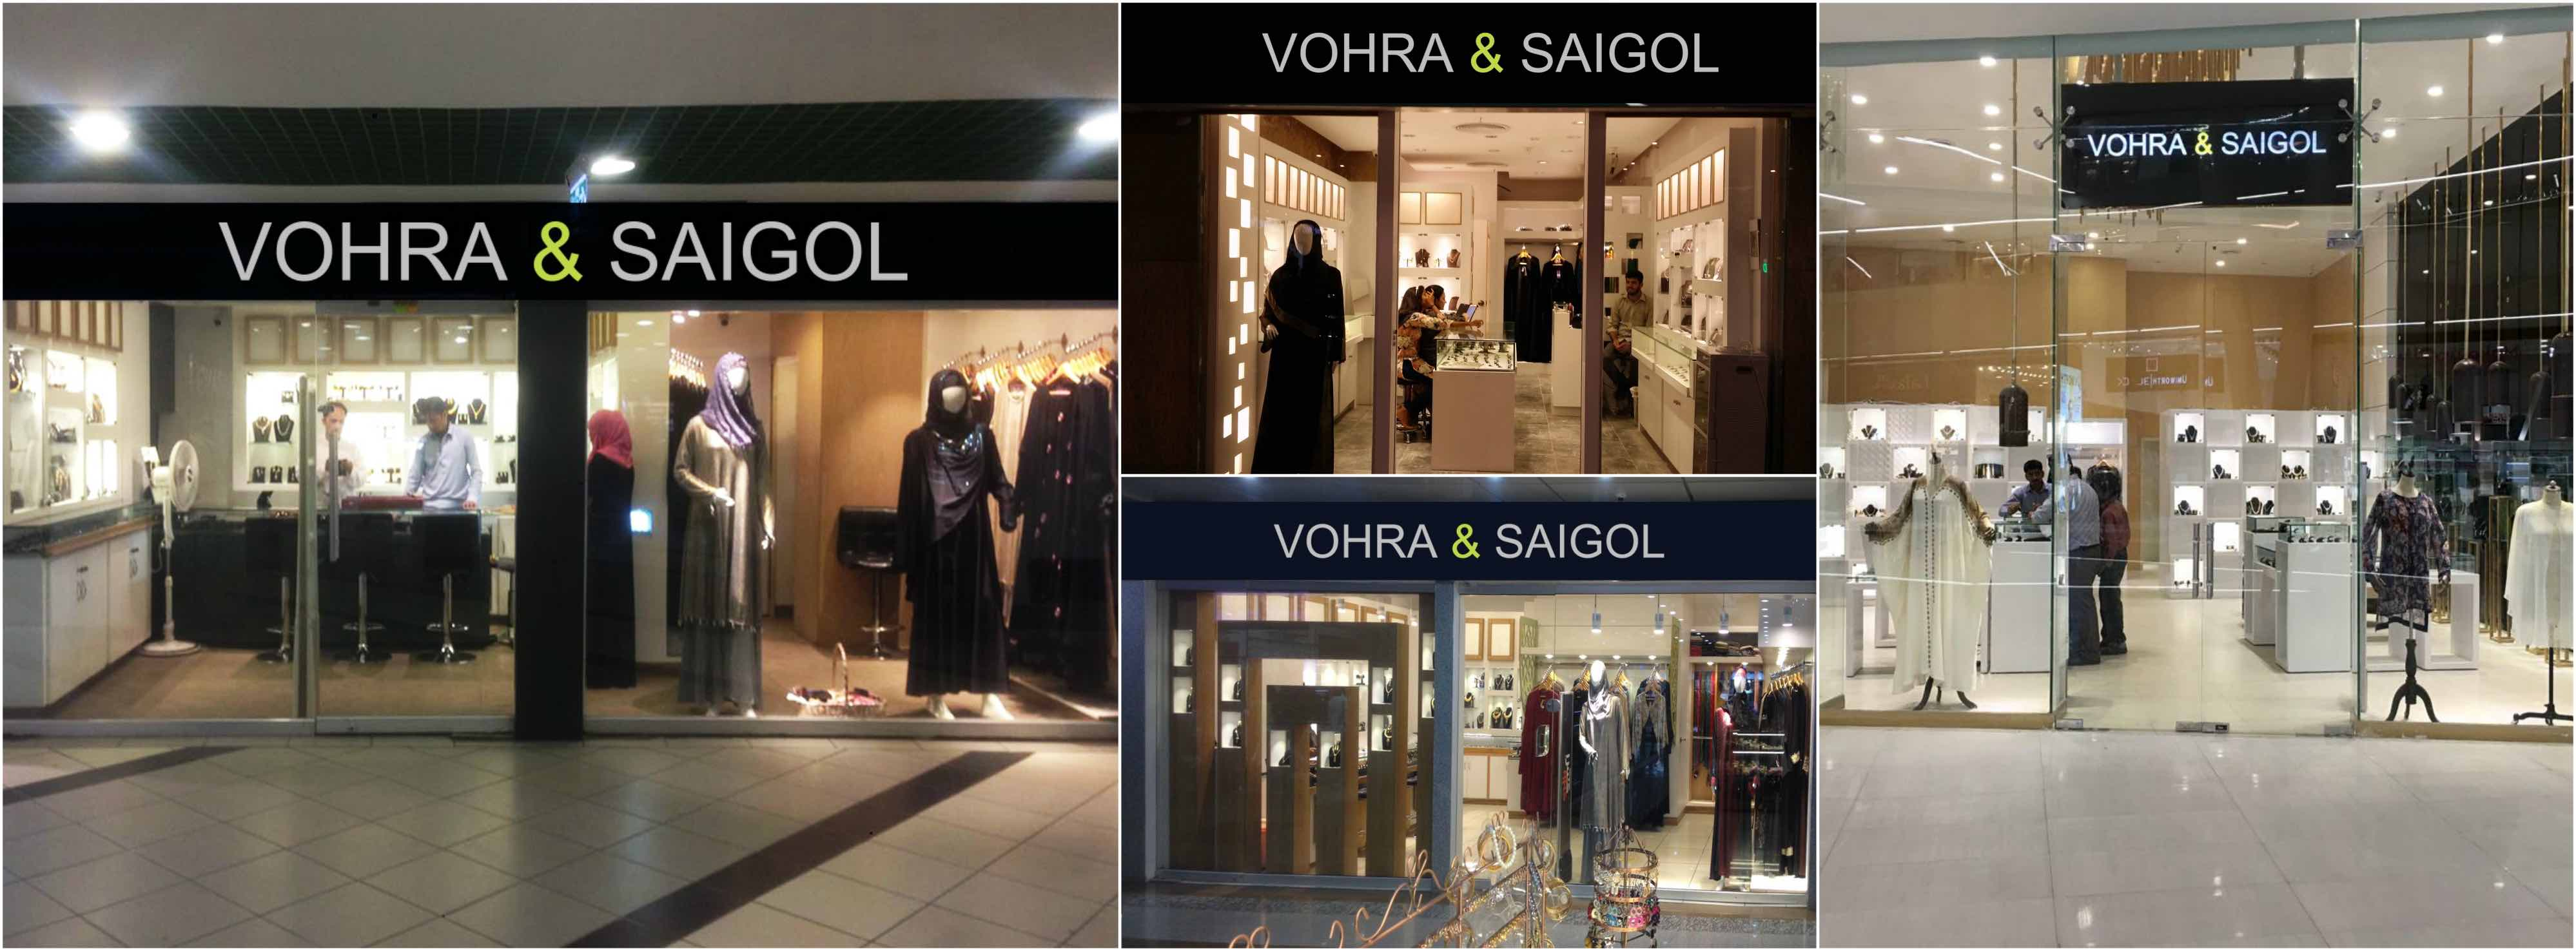 vohra-saigol-facebook7.jpg